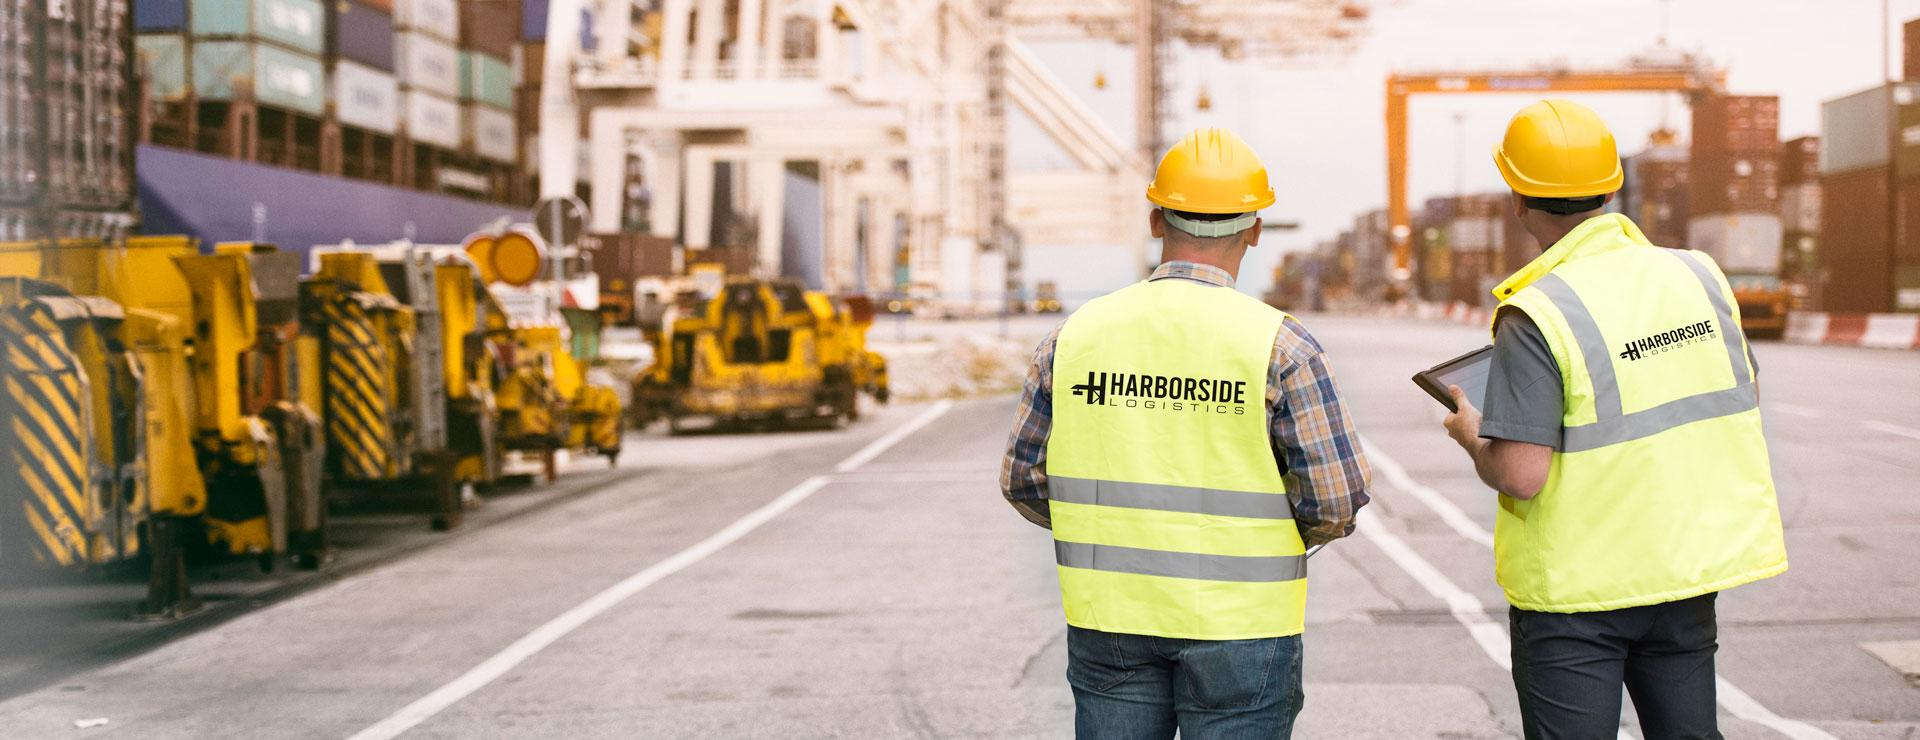 harborside_logistics_expertise